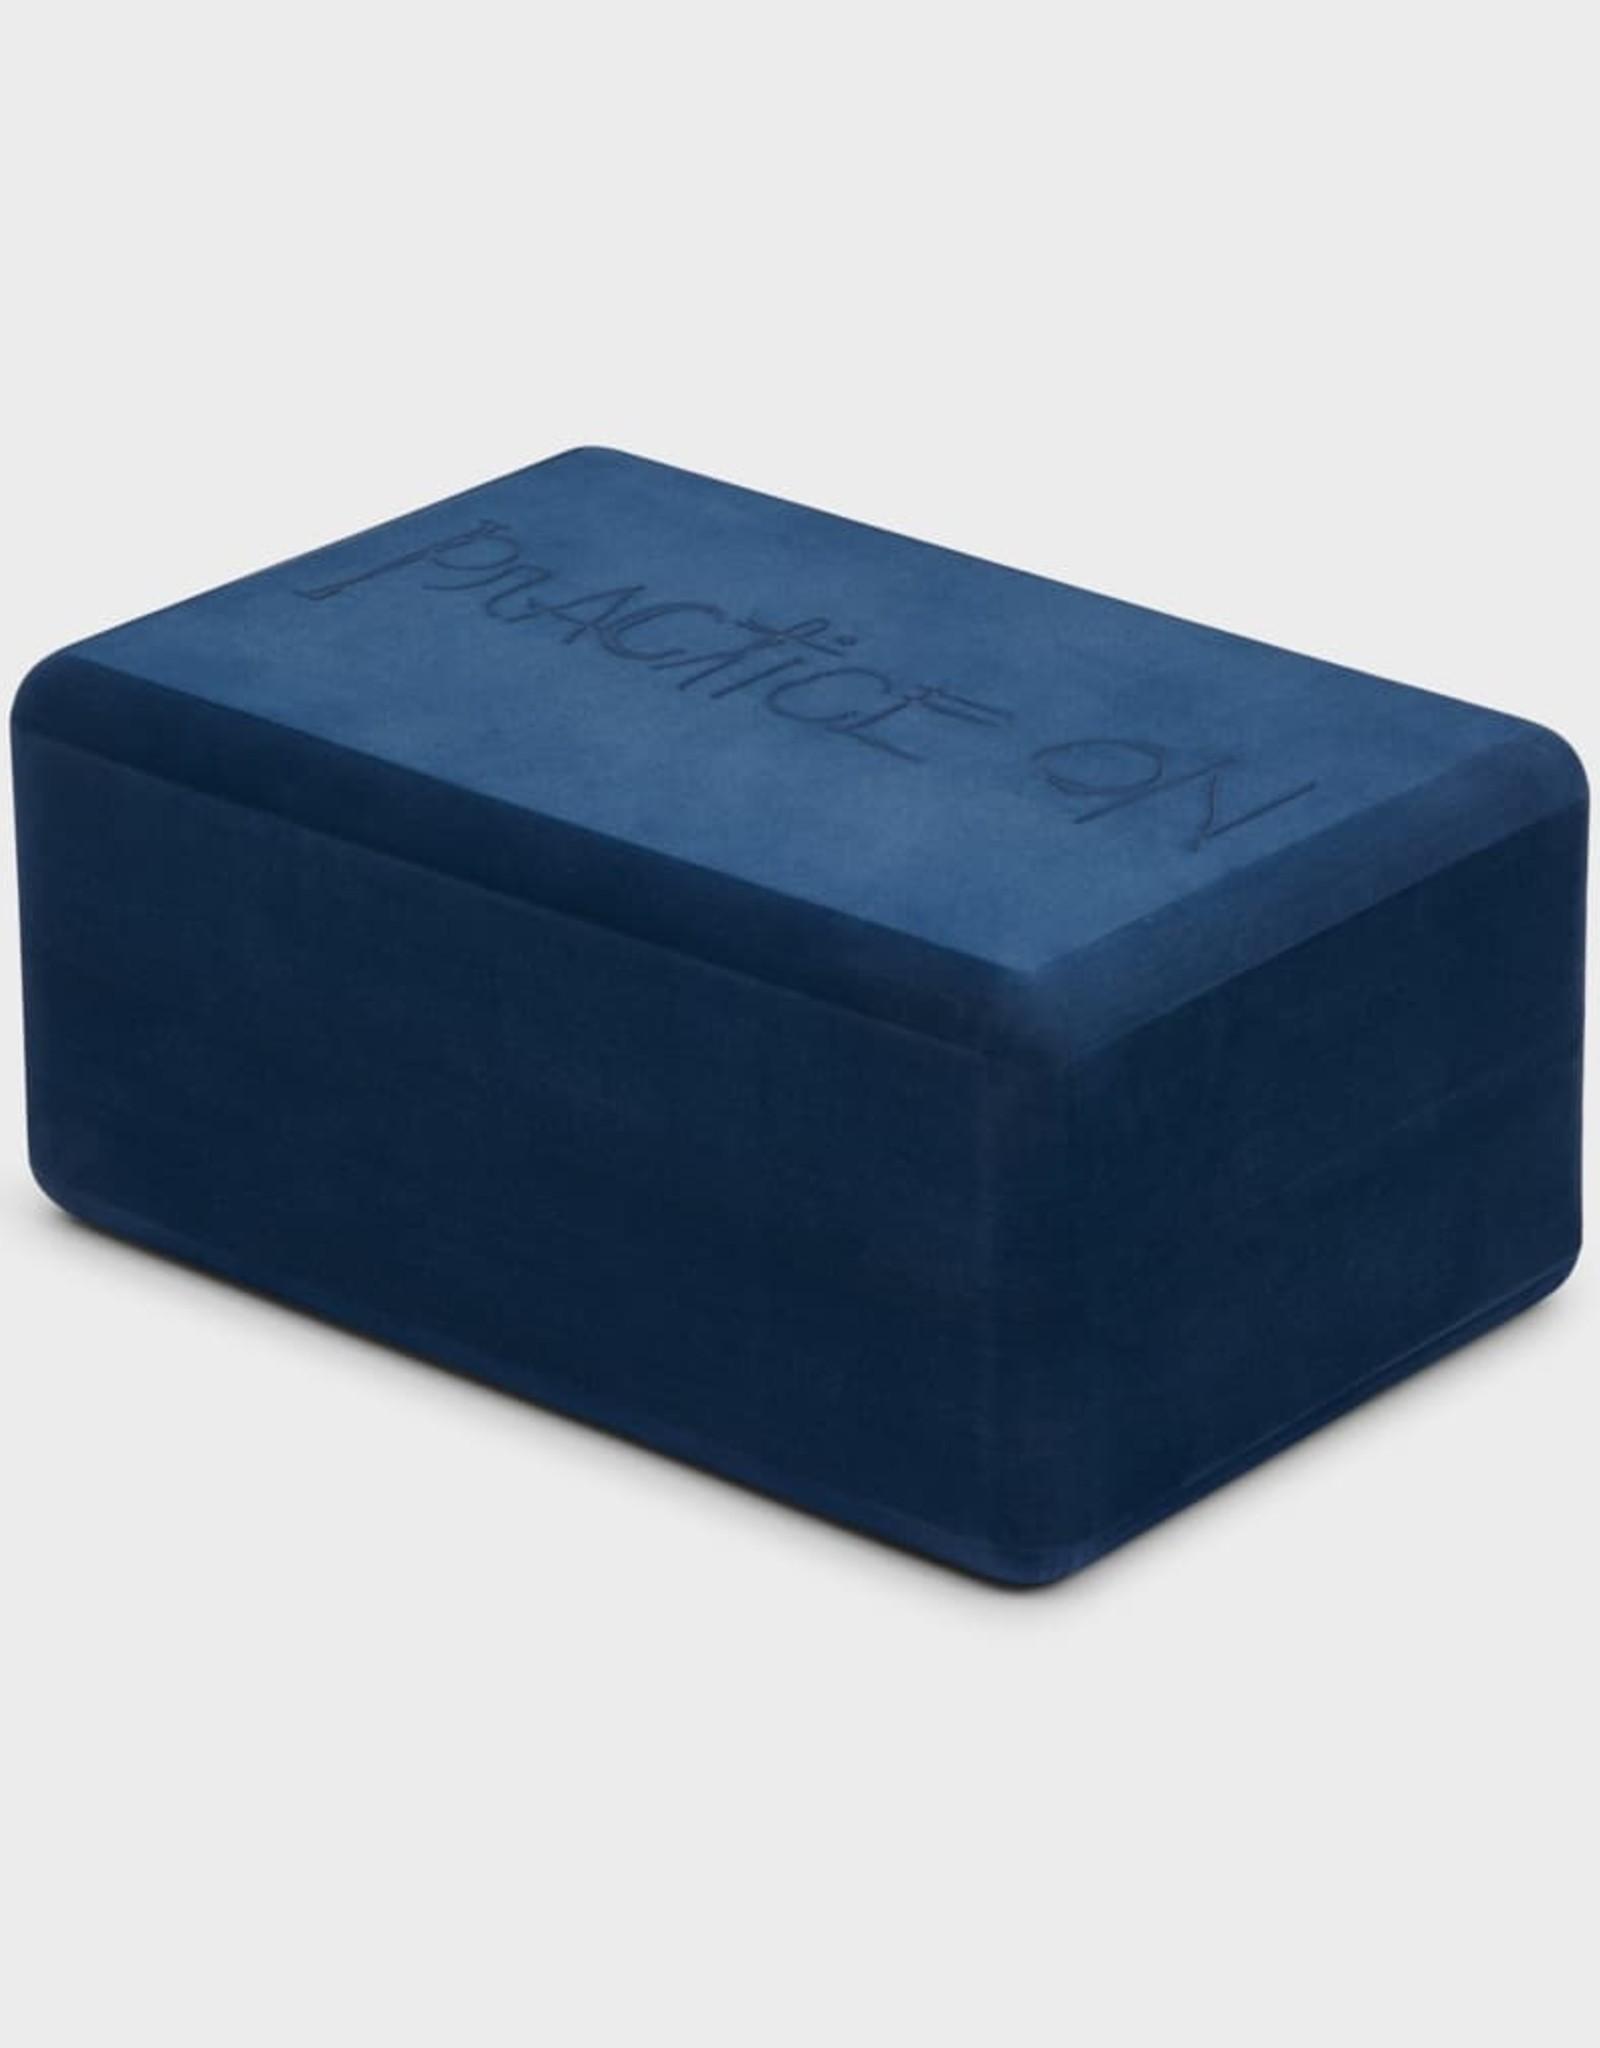 Manduka New Recycled Foam Yoga Block - Midnight